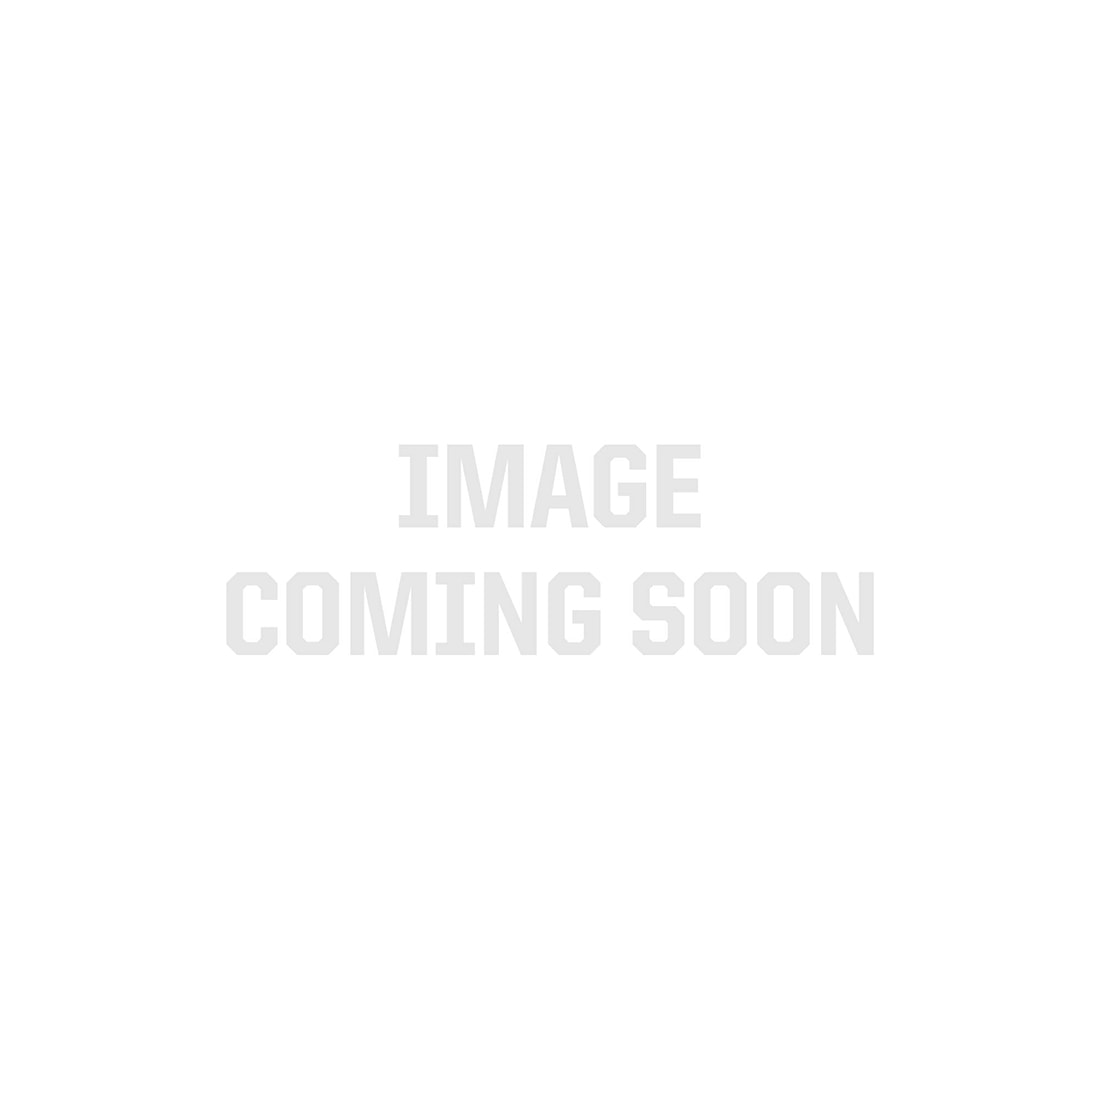 TruColor 2835 LED Strip Light - 5,000K - 80/m - CurrentControl - 10m Reel